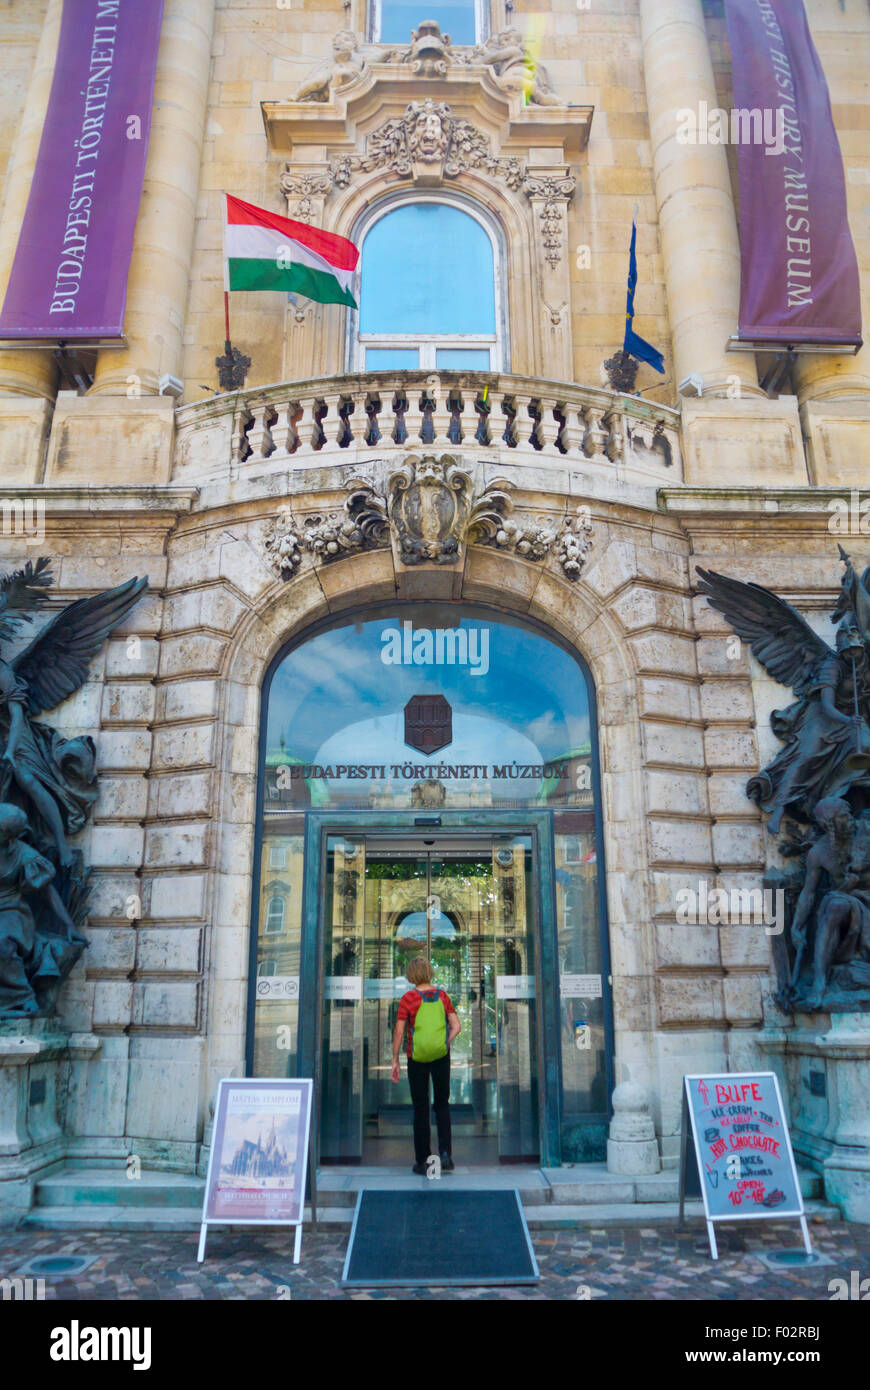 Budapest History Museum, Budavari Palota, the Castle, Castle district, Buda, Budapest, Hungary Stock Photo